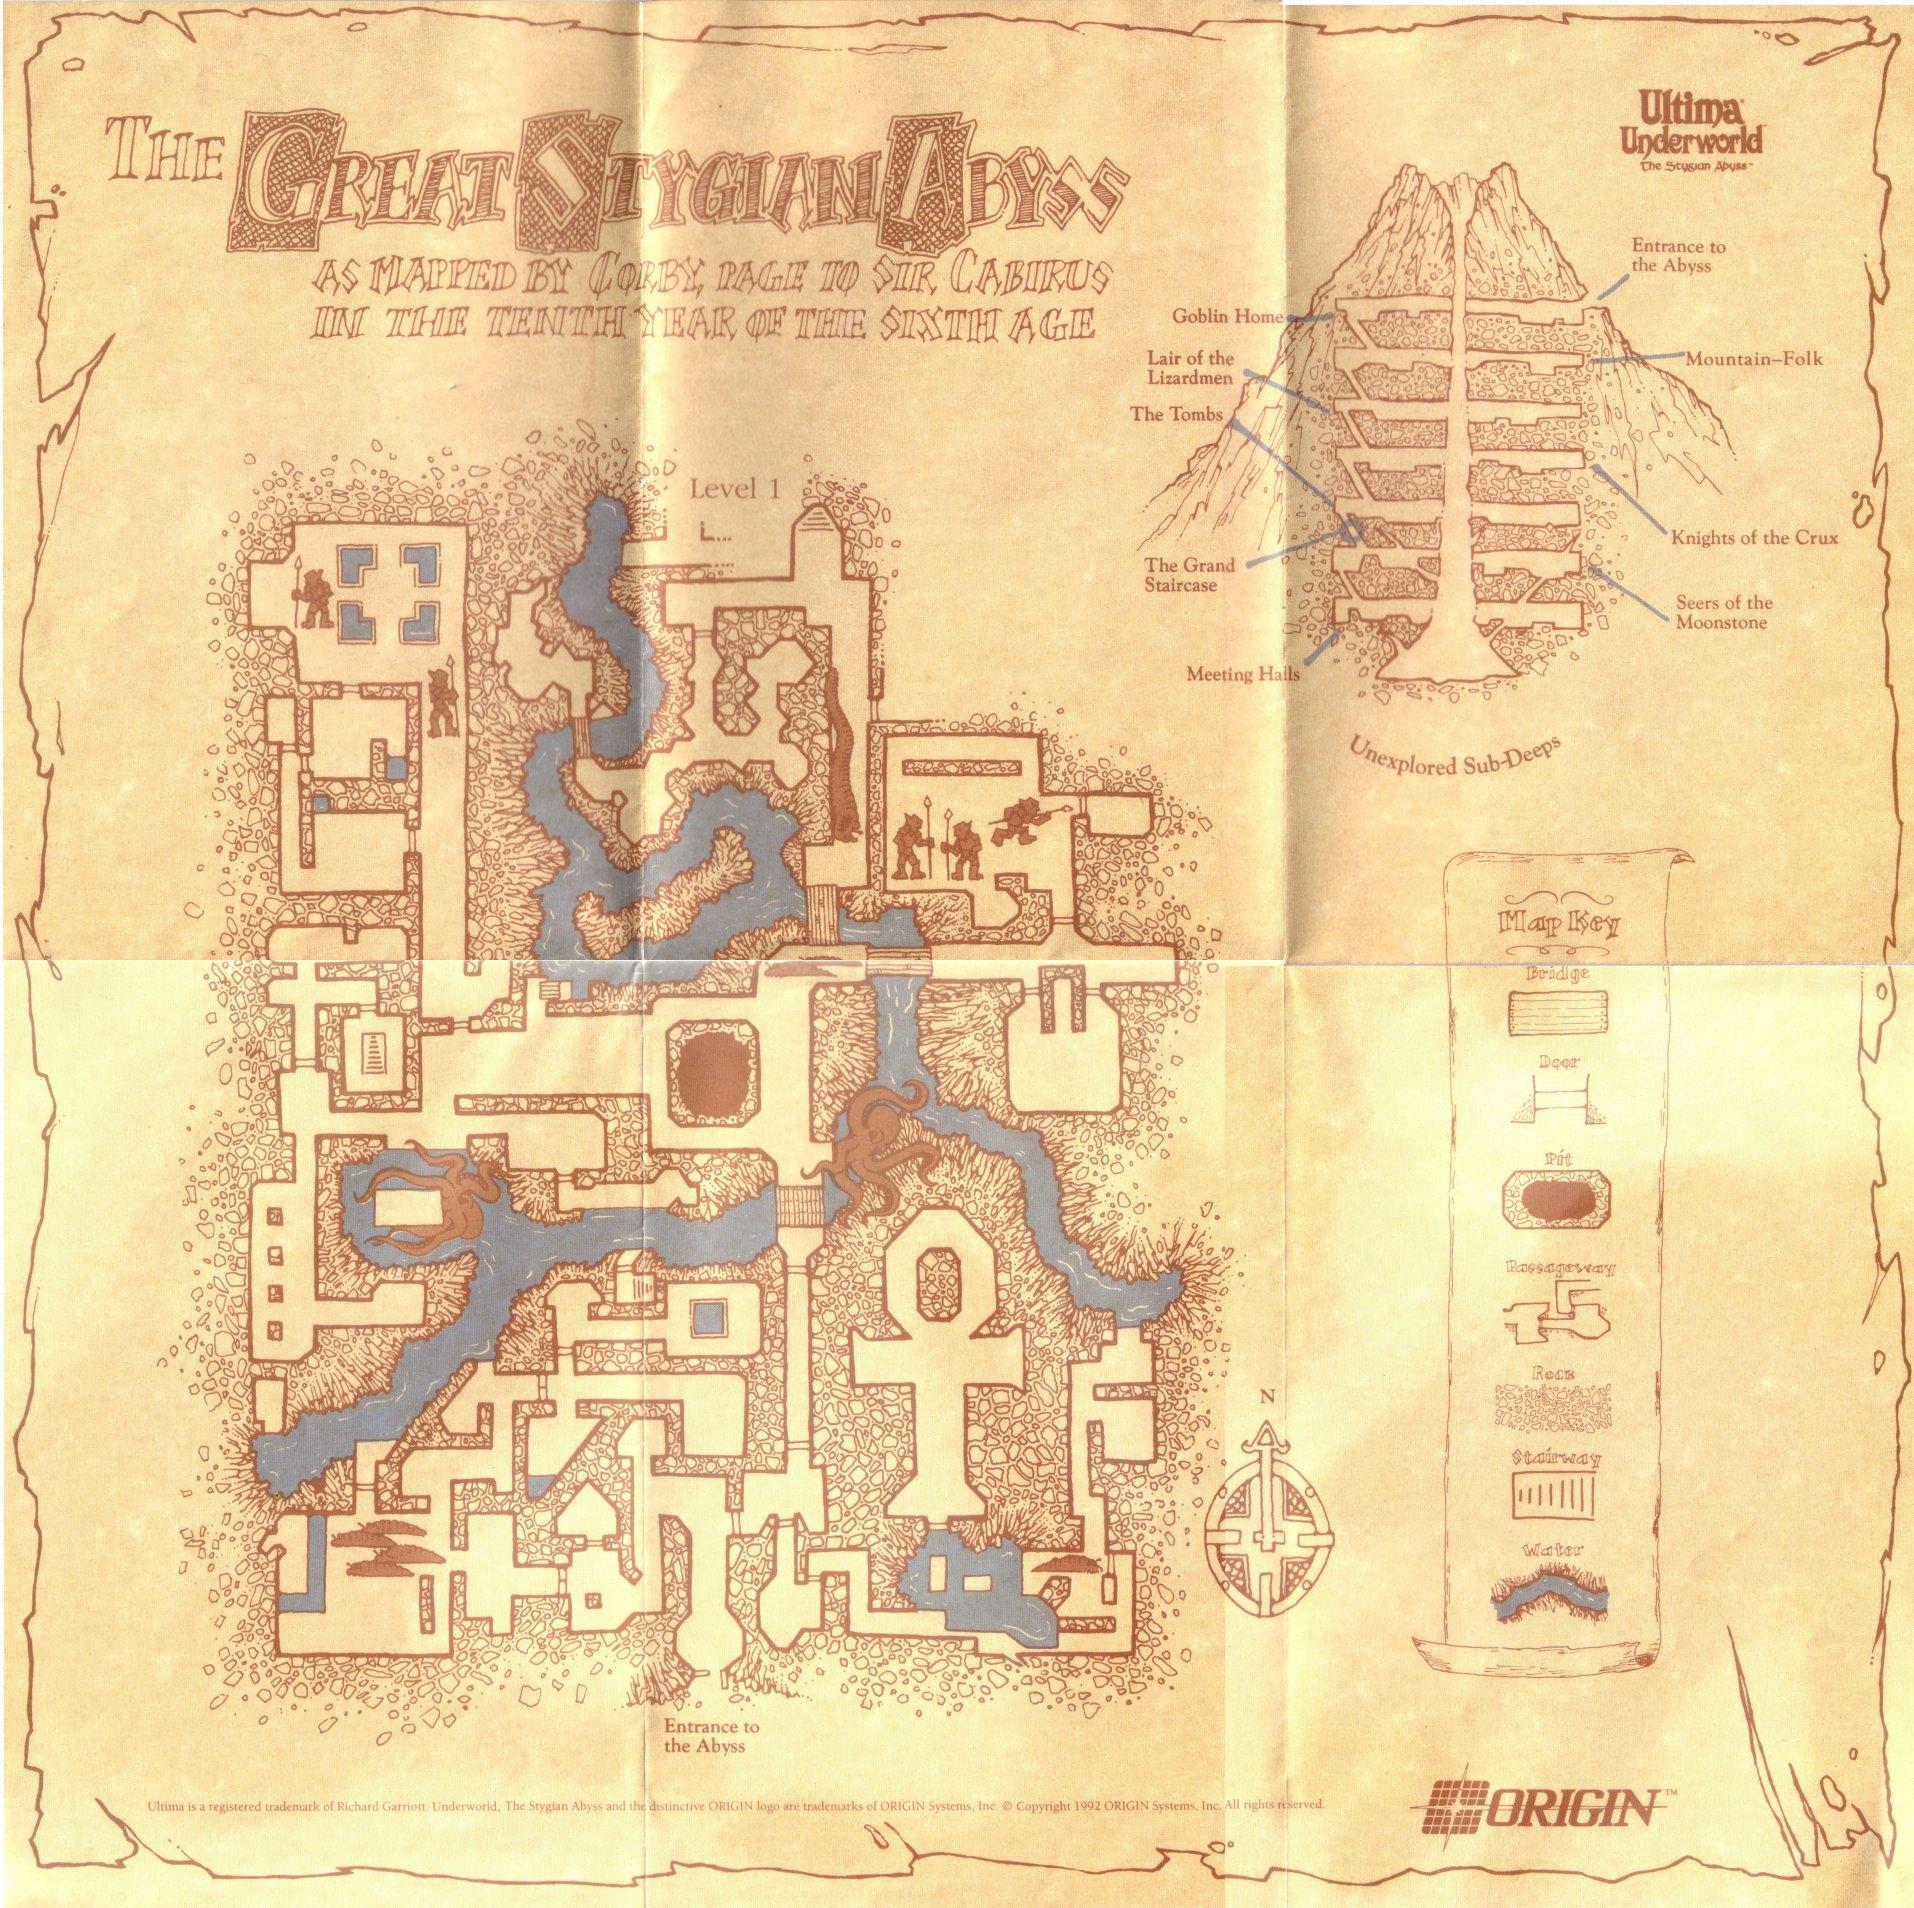 Dino's ultima page ultima underworld 1: the stygian abyss.